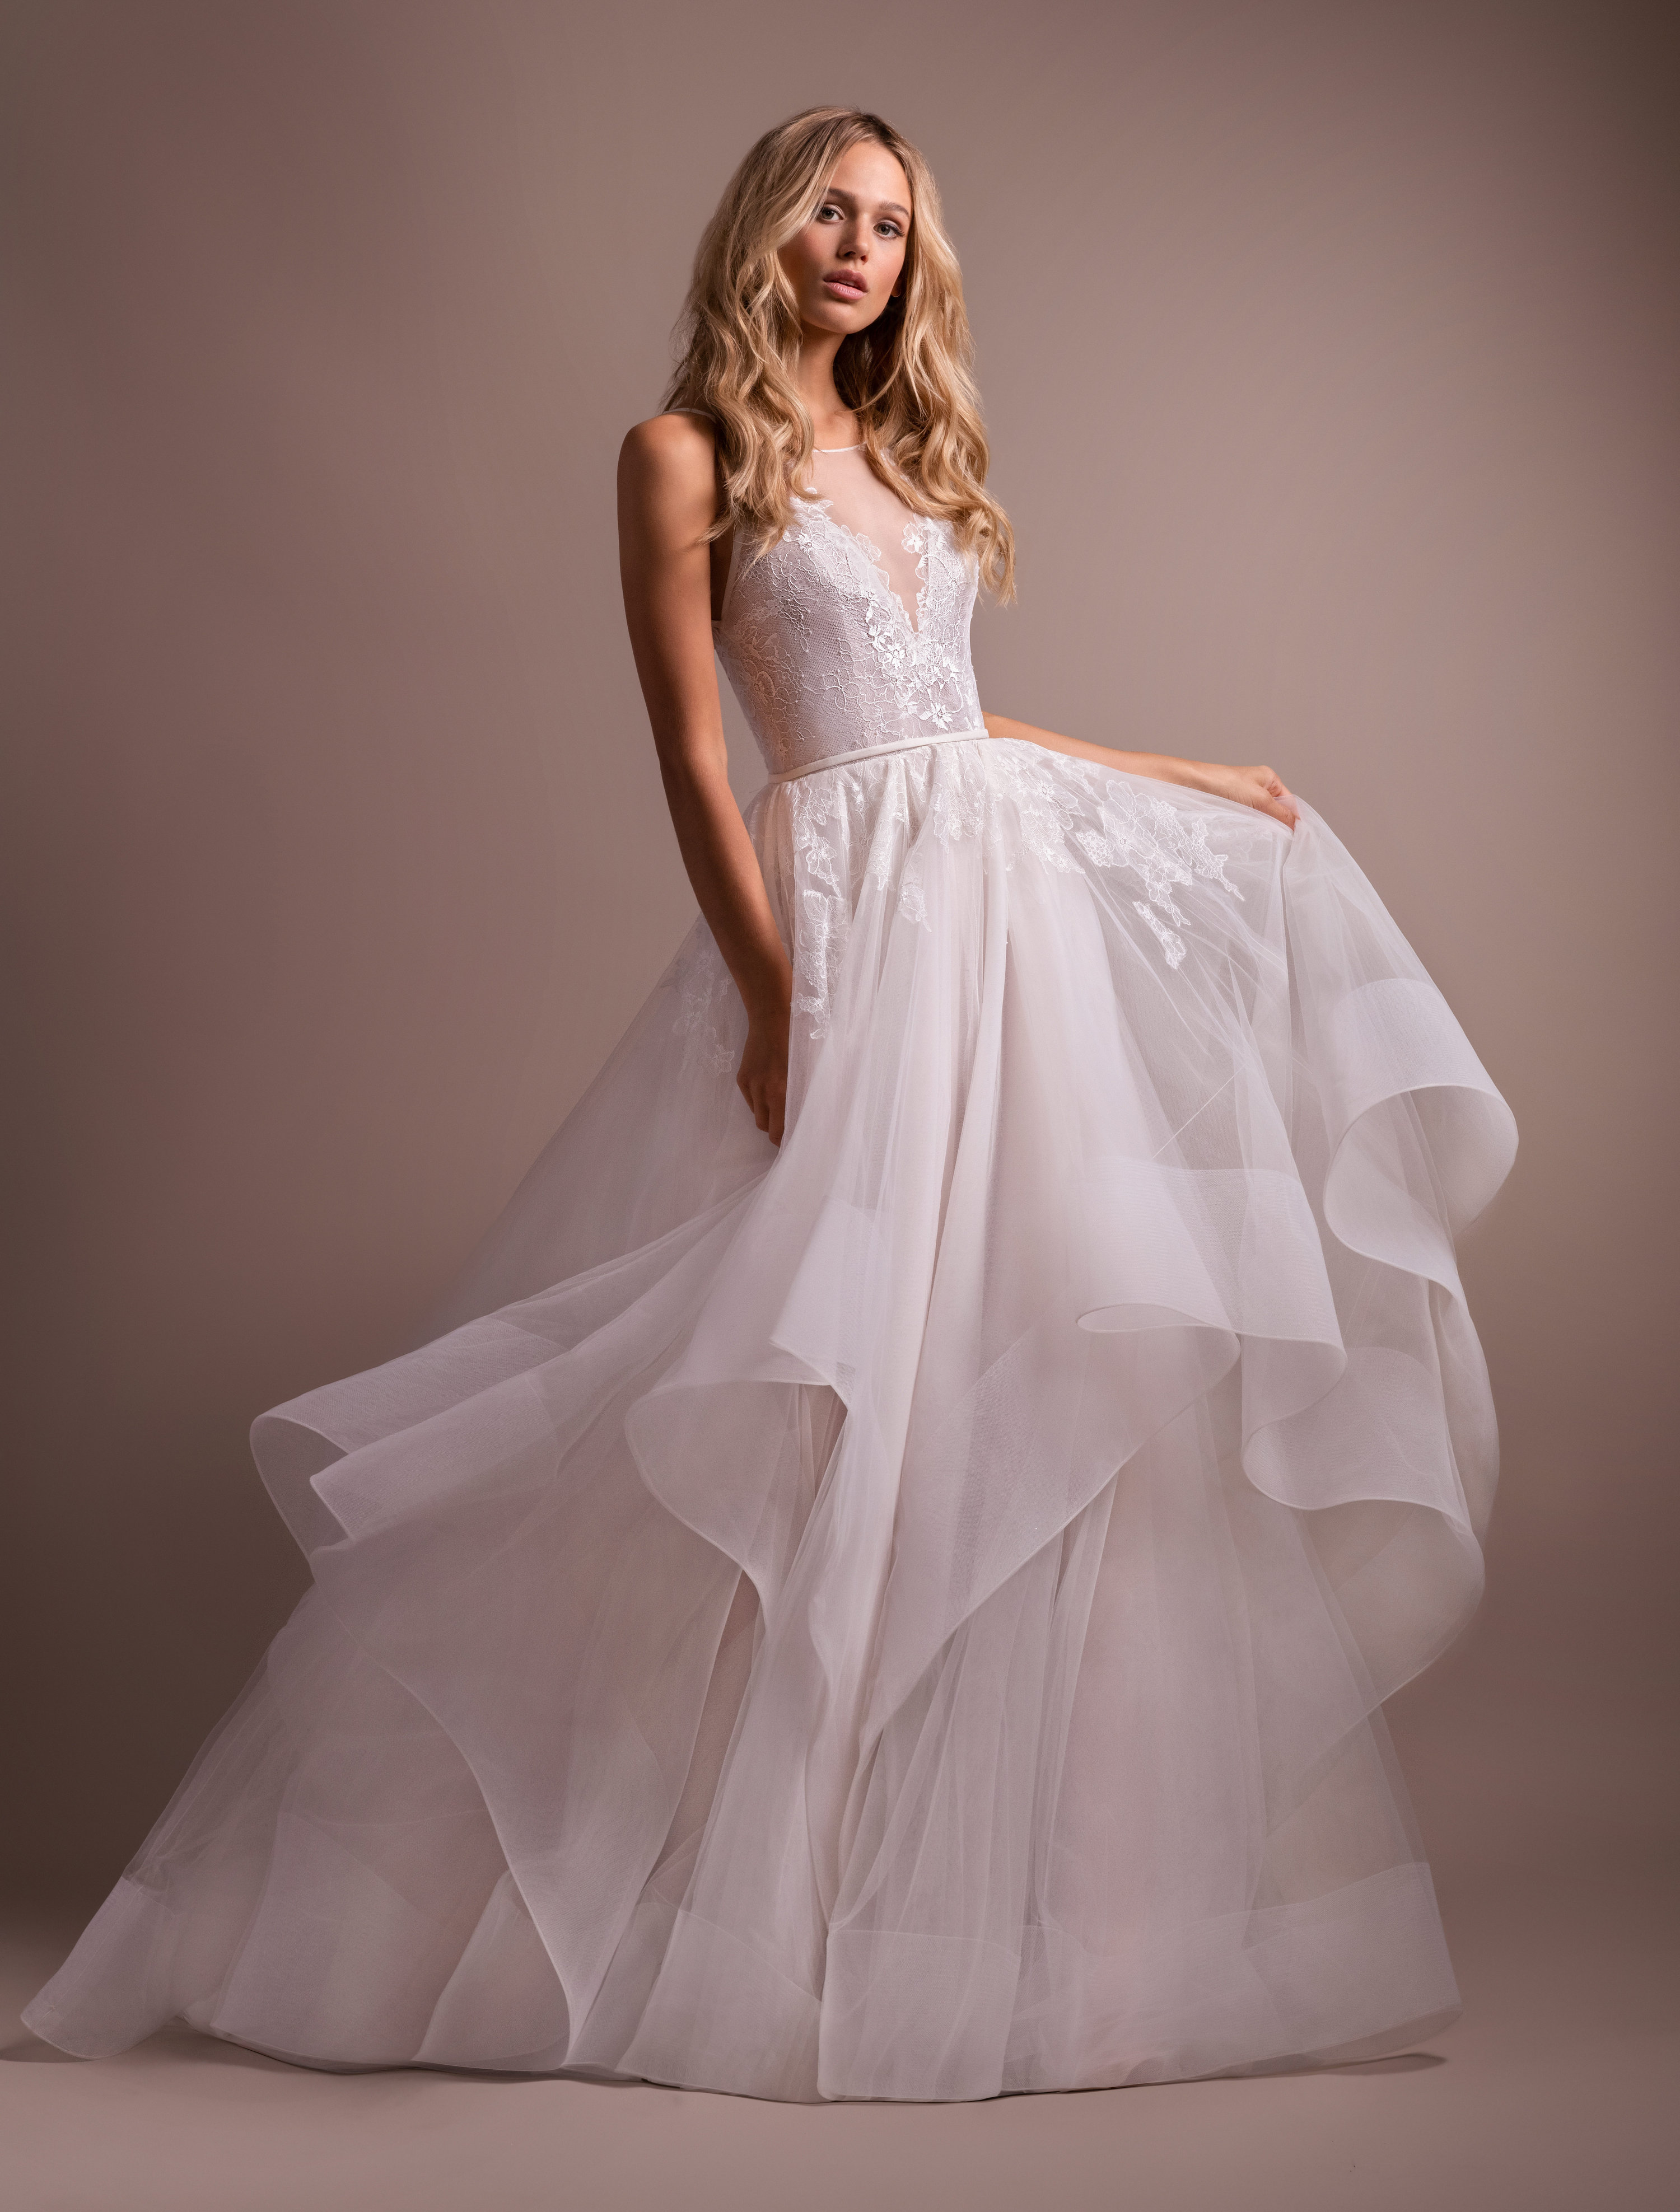 450d5500bb7 Bridesmaid Dress Lace Bodice Chiffon Skirt - Gomes Weine AG